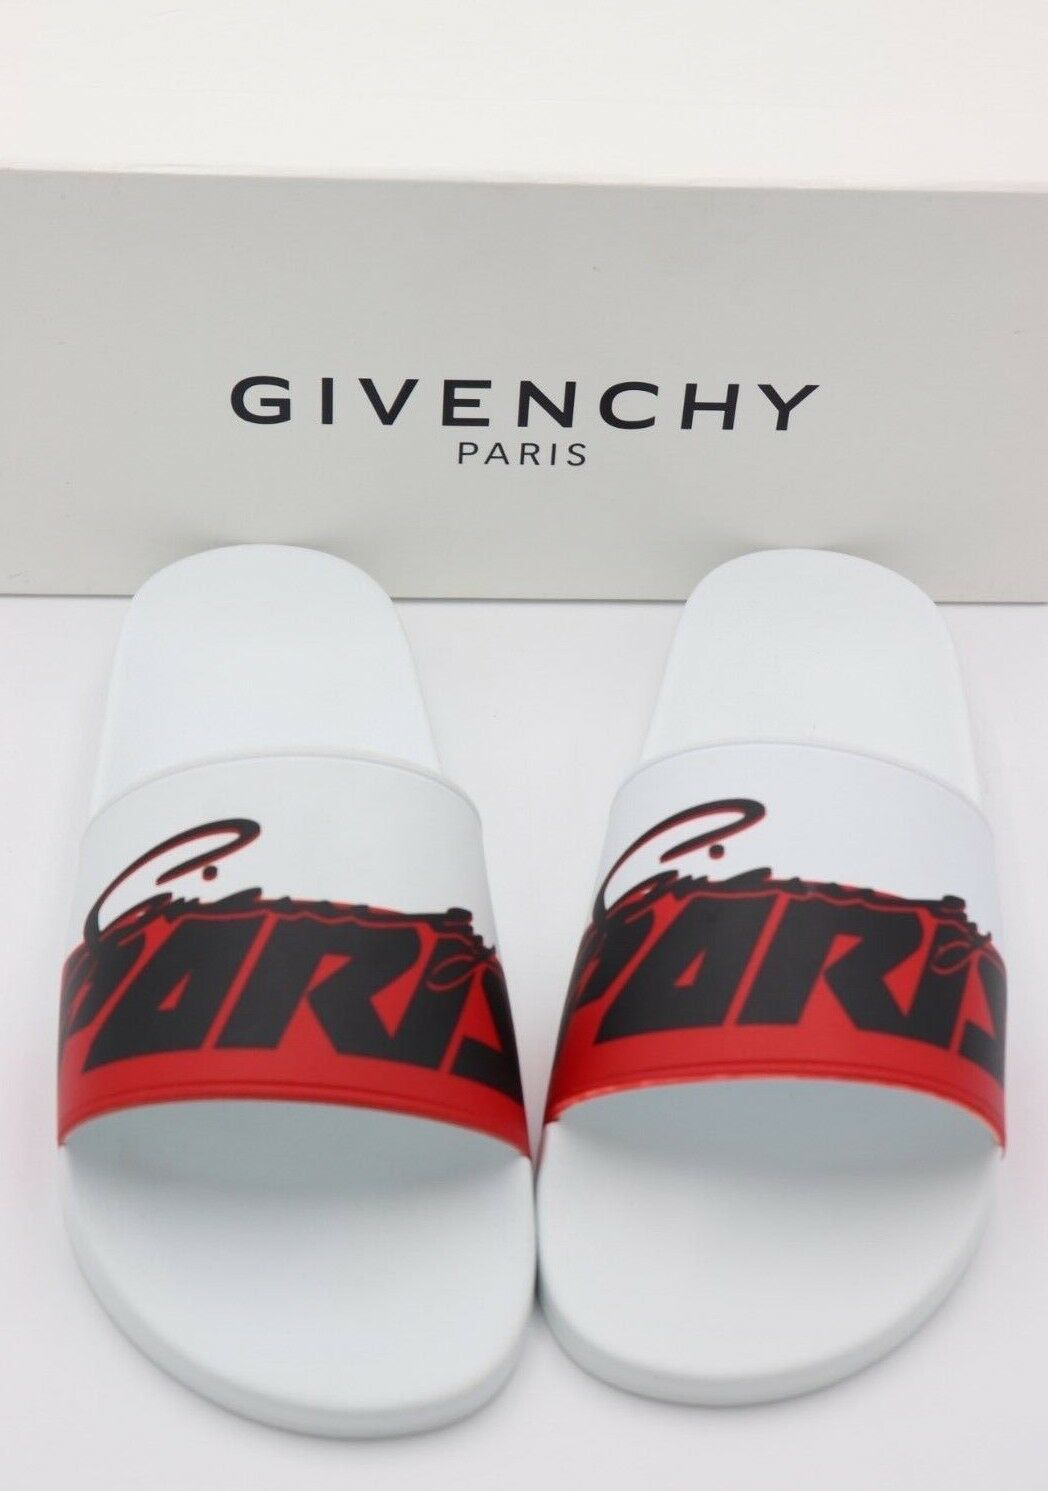 0d4491cefd4 Givenchy Paris Mens Printed Motocross Pool Slide Sandals 14 47 for ...